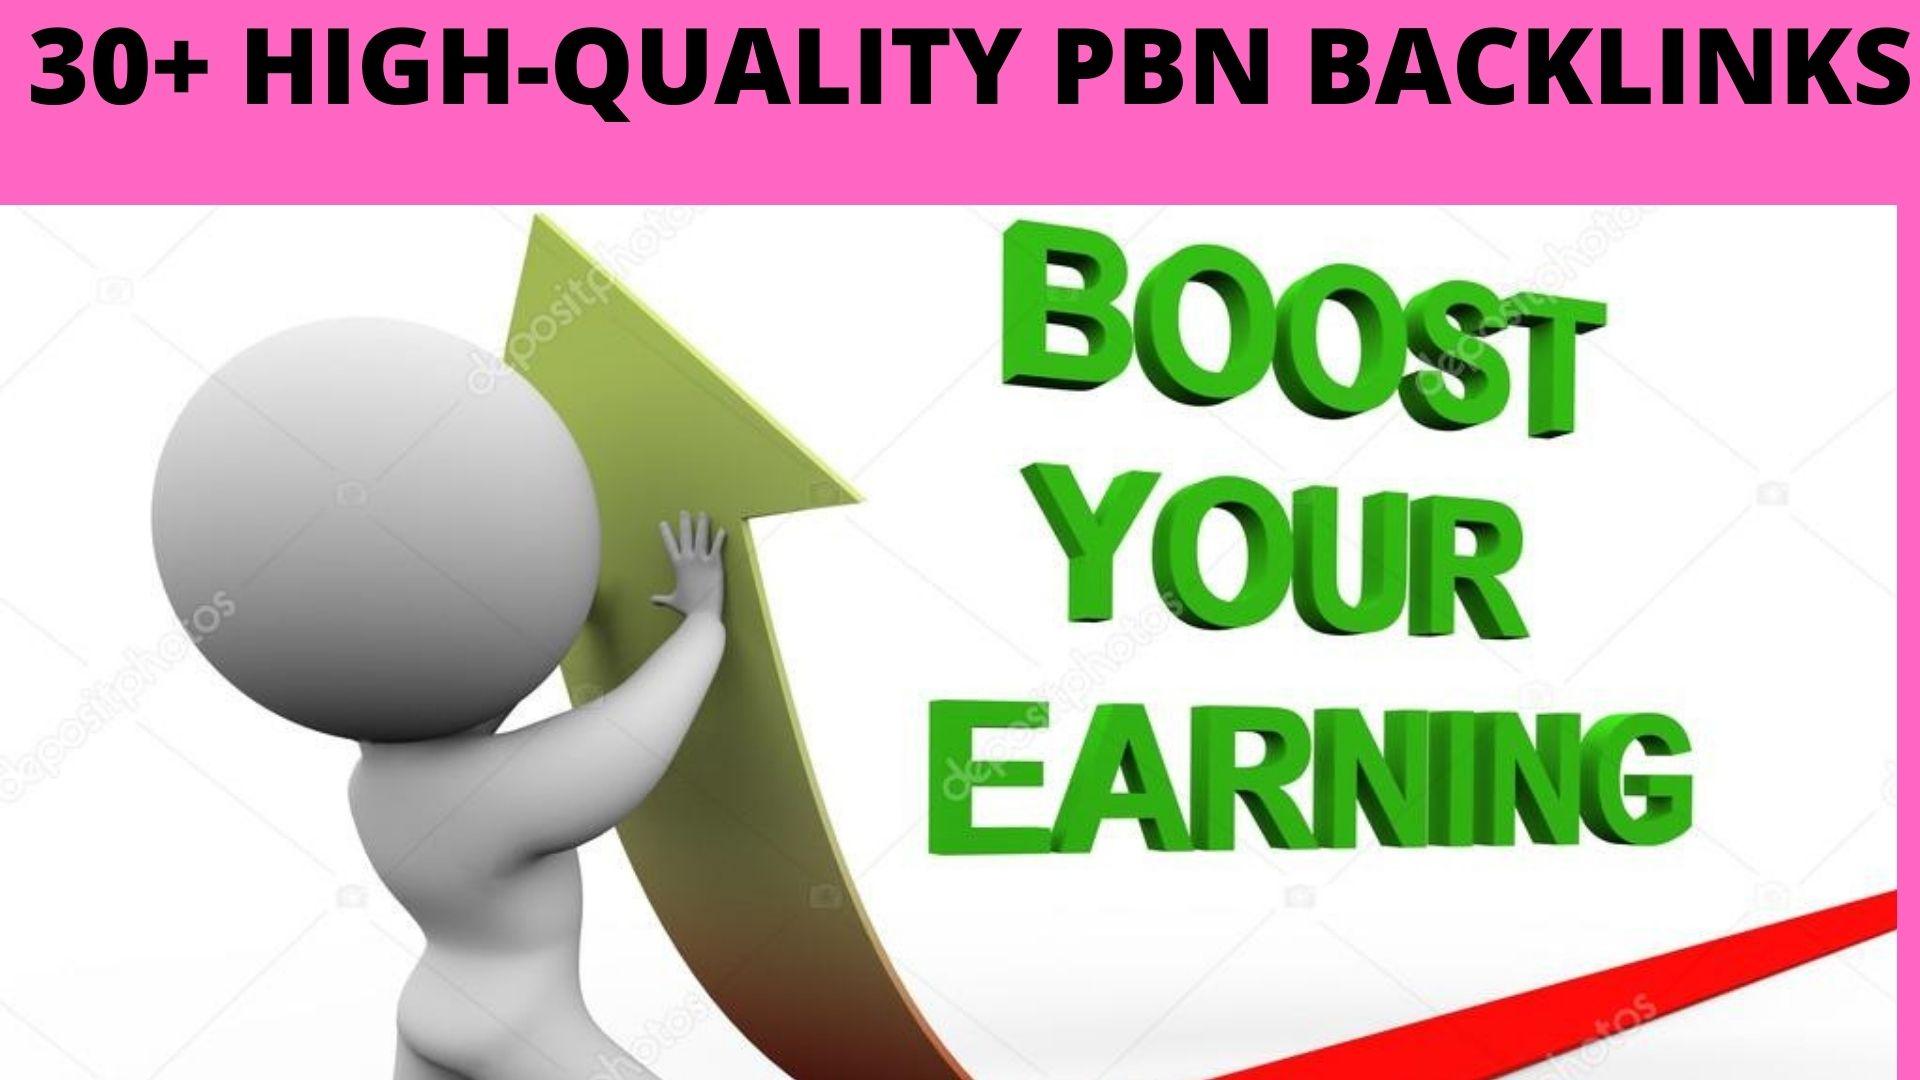 Get 30+ High DA 60+ PBN Backlink to Rank Your Website by better solution.